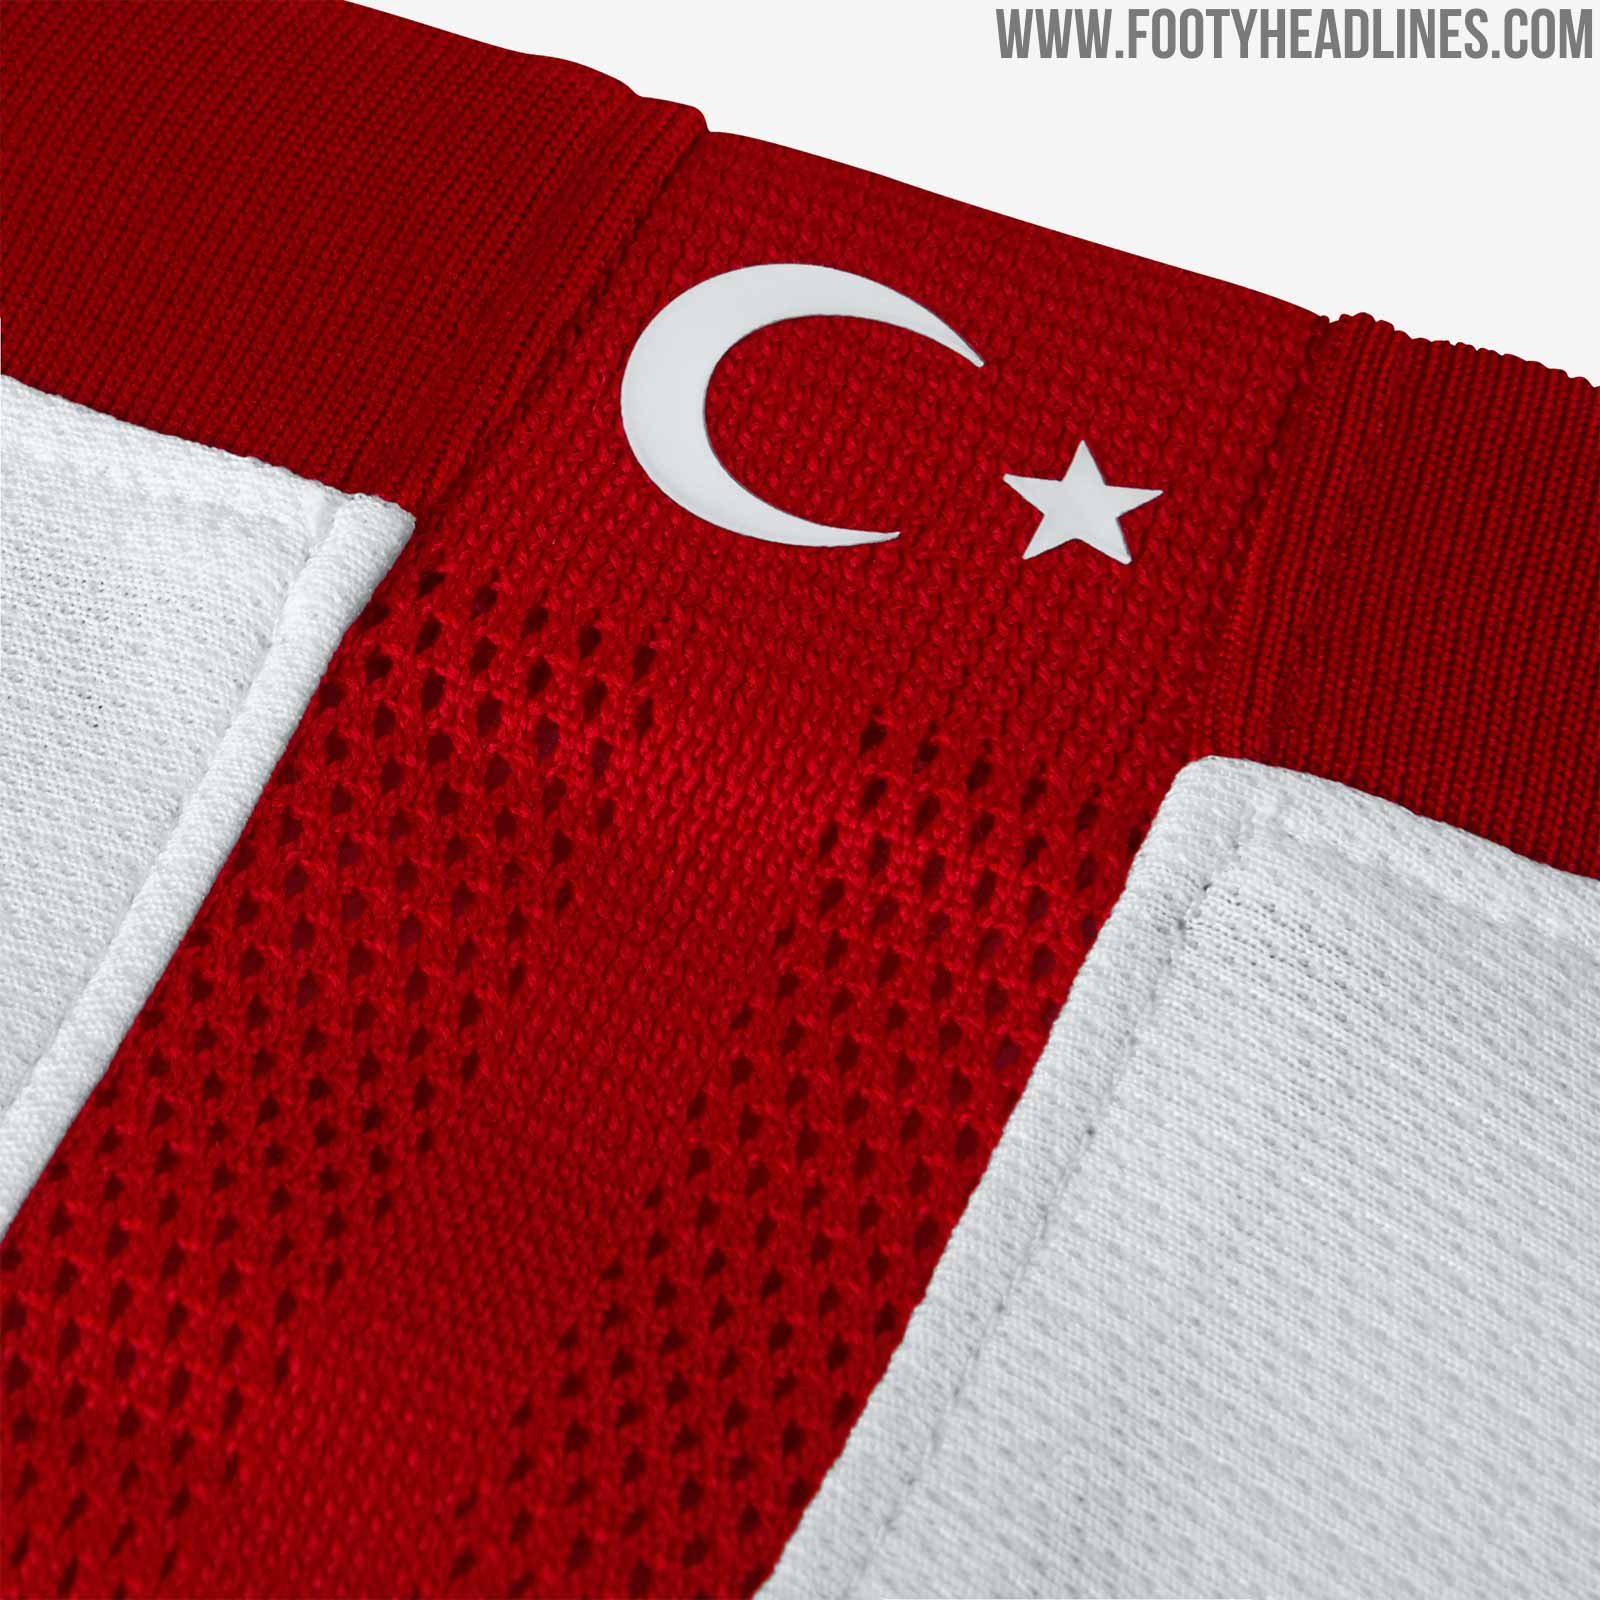 https://1.bp.blogspot.com/-F818aRV0Euc/WrAMKABNFCI/AAAAAAABd8A/cVljlu_paUACwzLgxrJIL2-cPAbfNW8MgCLcBGAs/s1600/turkey-2018-home-away-kits-9.jpg